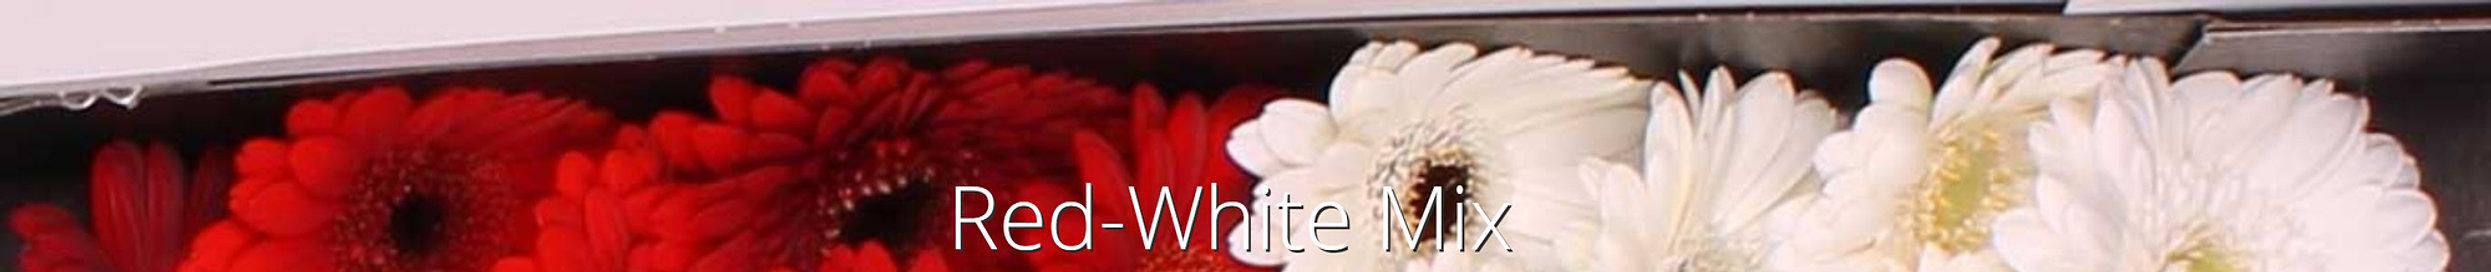 rood wit mix.jpg